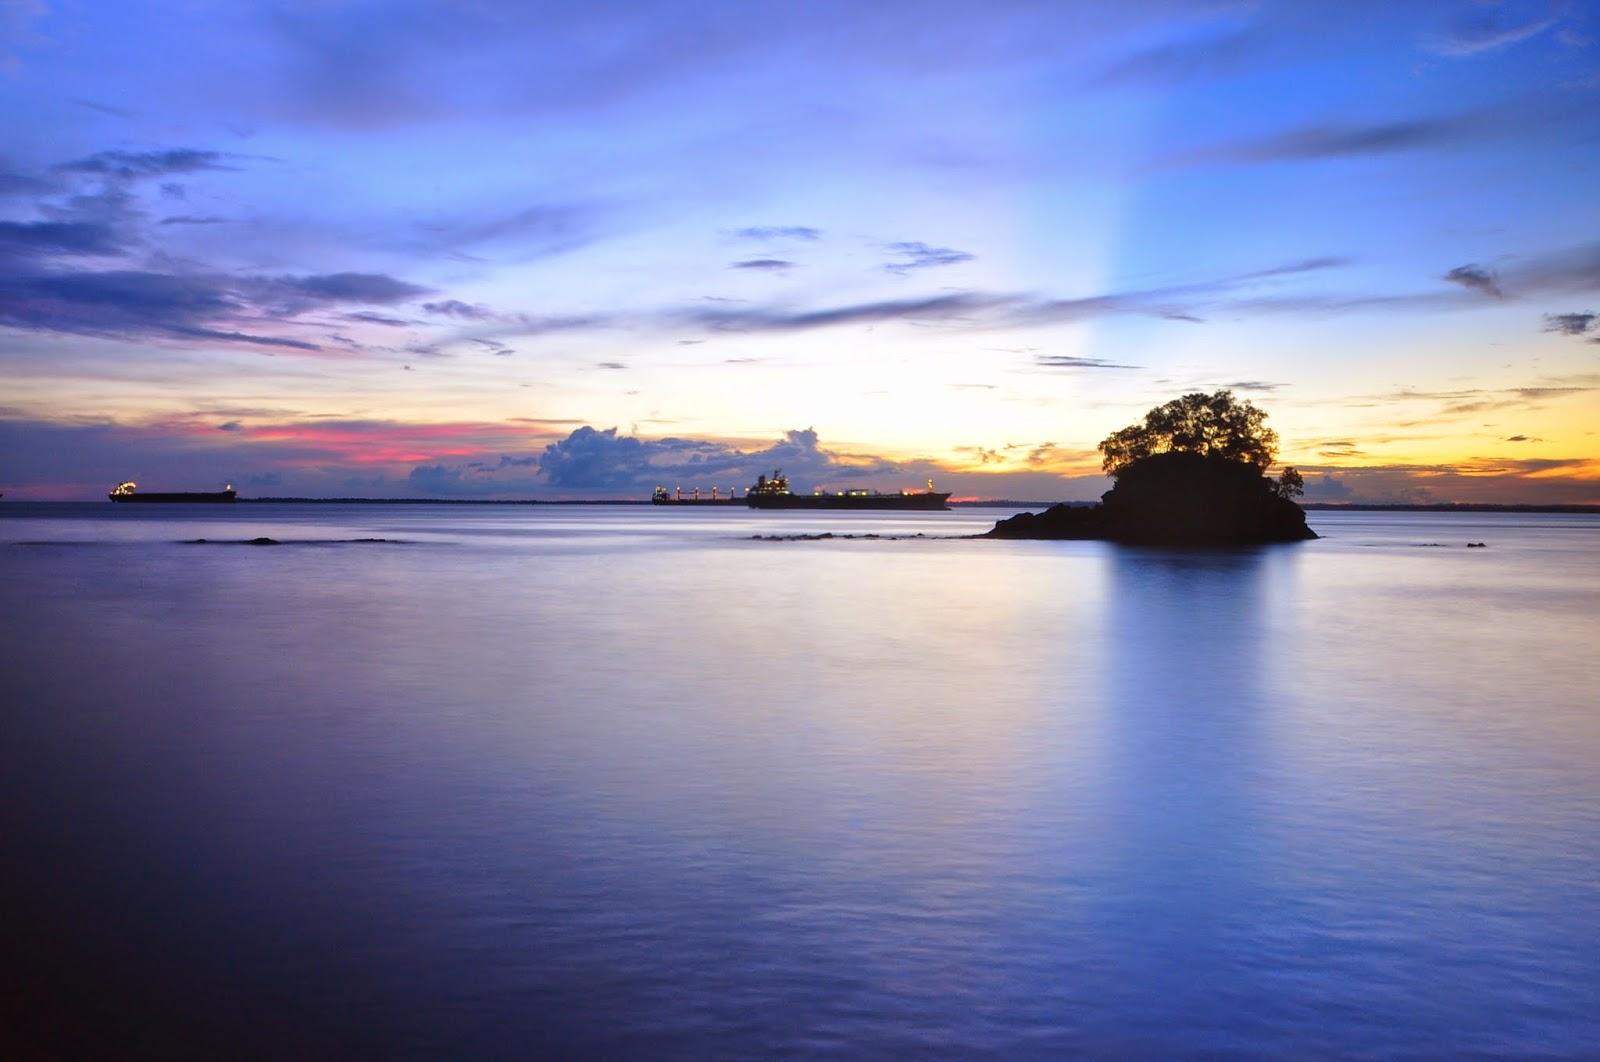 Wisata Pantai Melawai